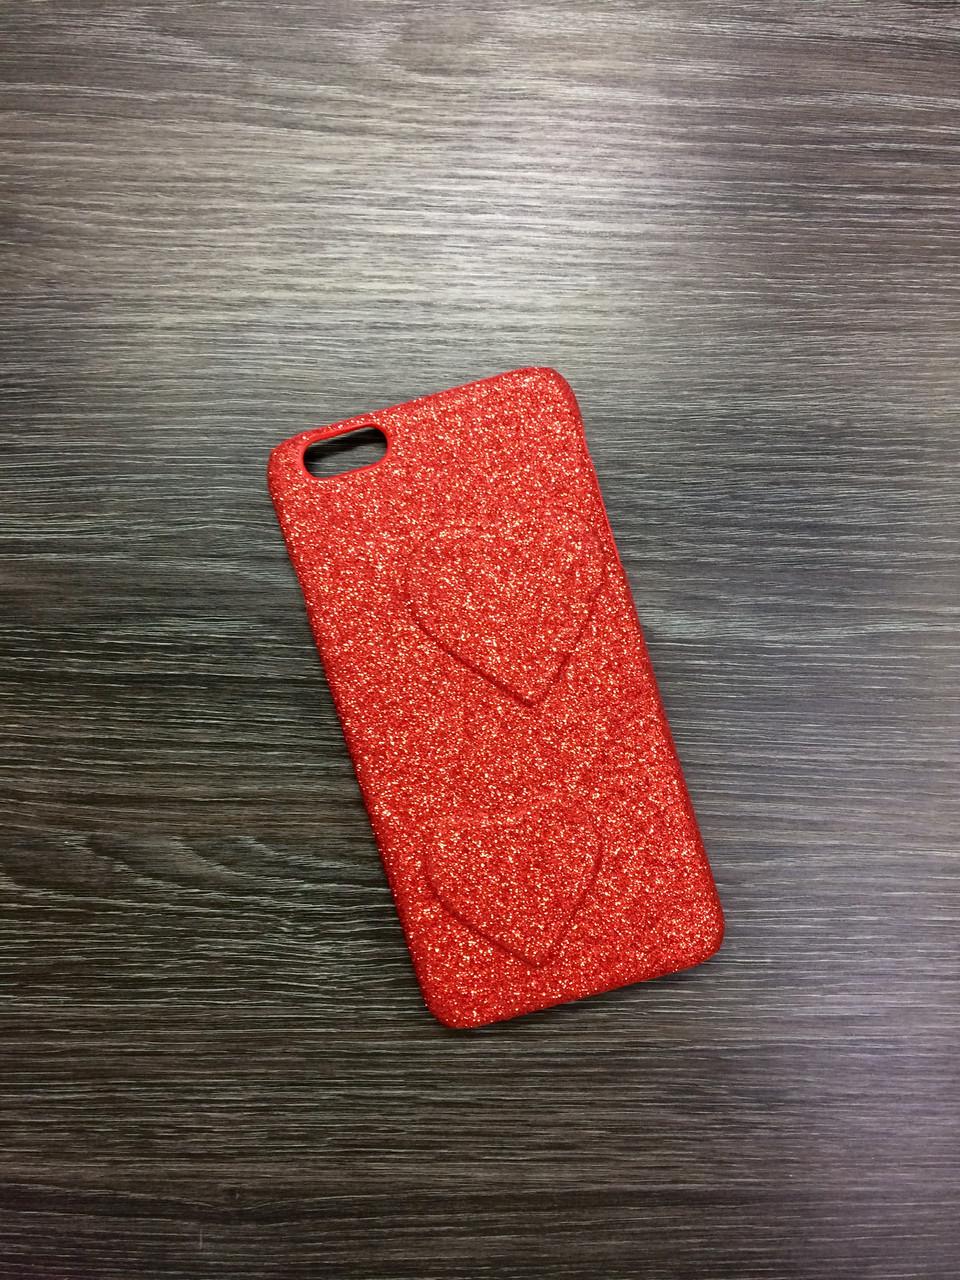 Пластиковый чехол для iPhone 7 Plus / 8 Plus Red с сердцами